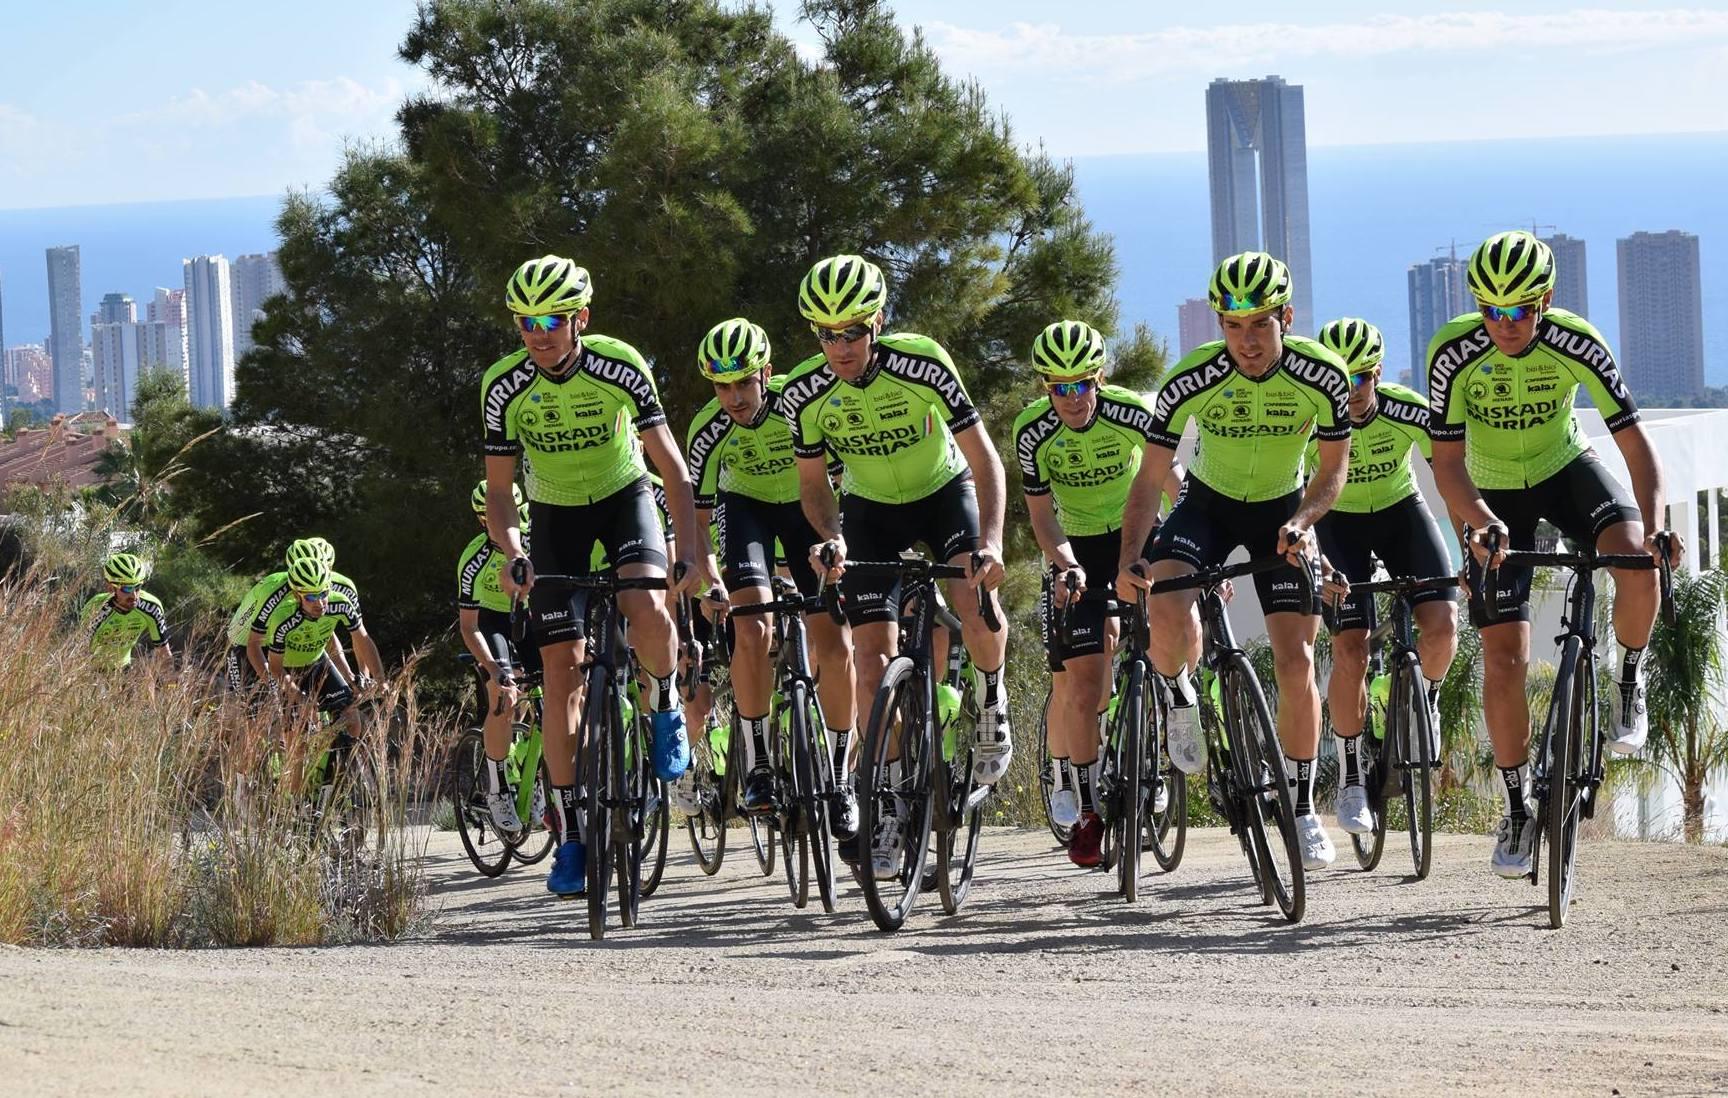 Invitaciones de la Vuelta - Euskadi JoanSeguidor